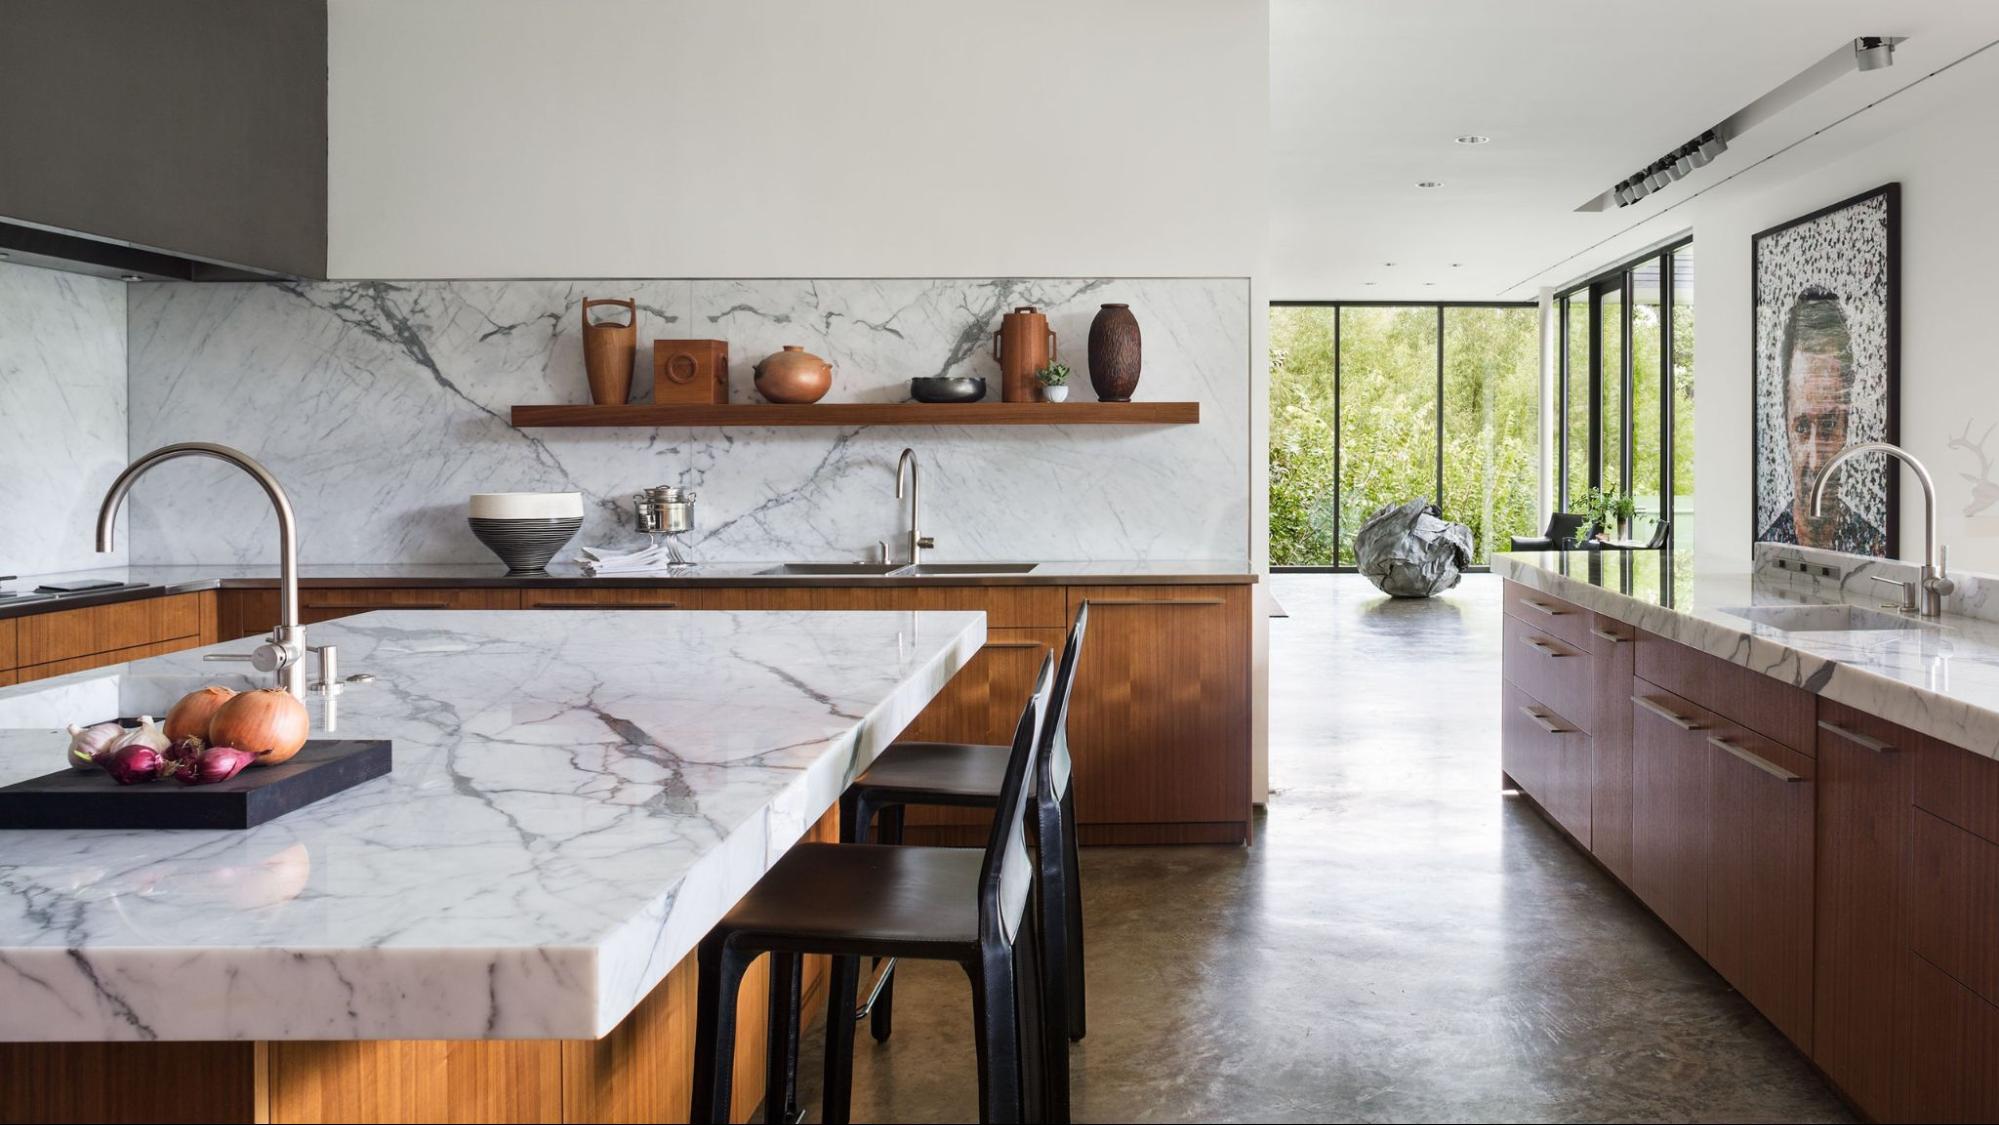 Bianco Marble Slab On Kitchen Countertops And Backsplash